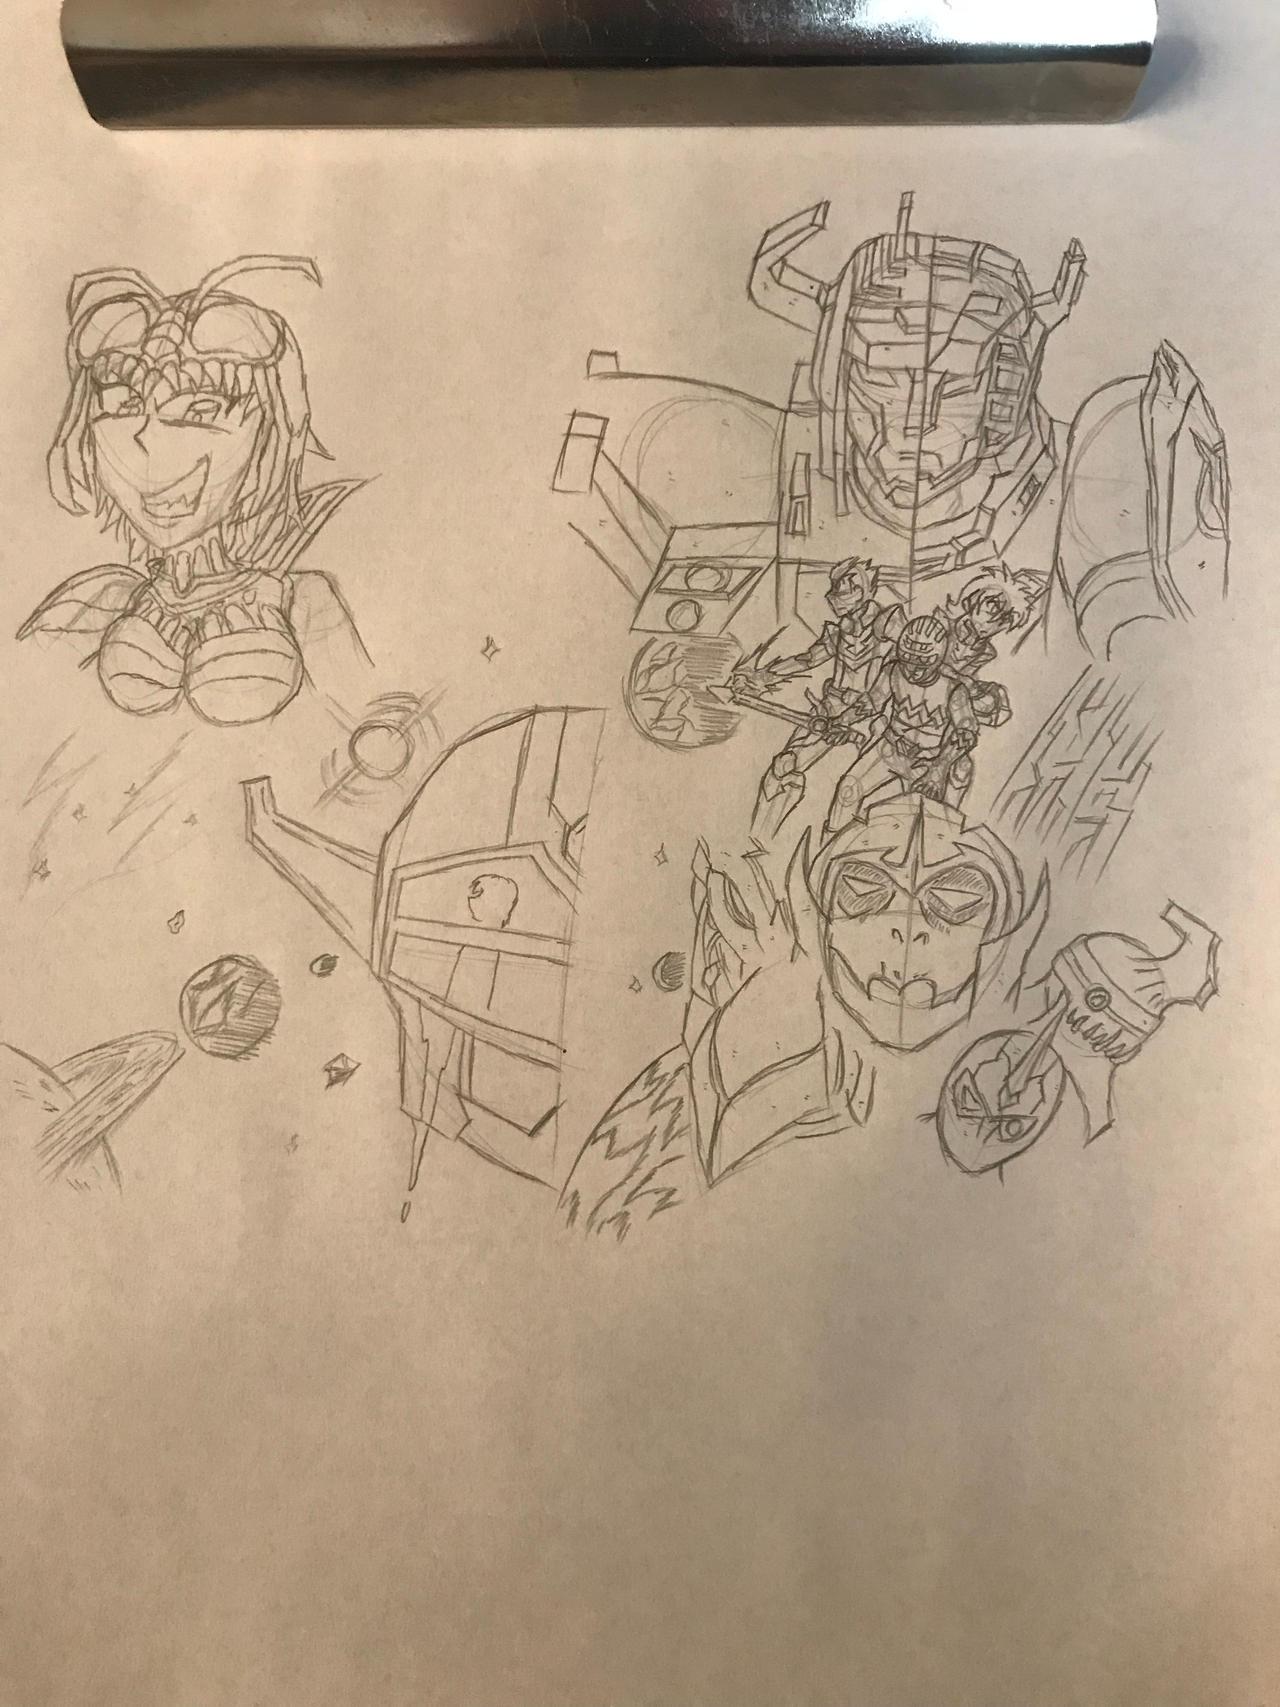 Gingaman x Voltron Legendary Defender S1